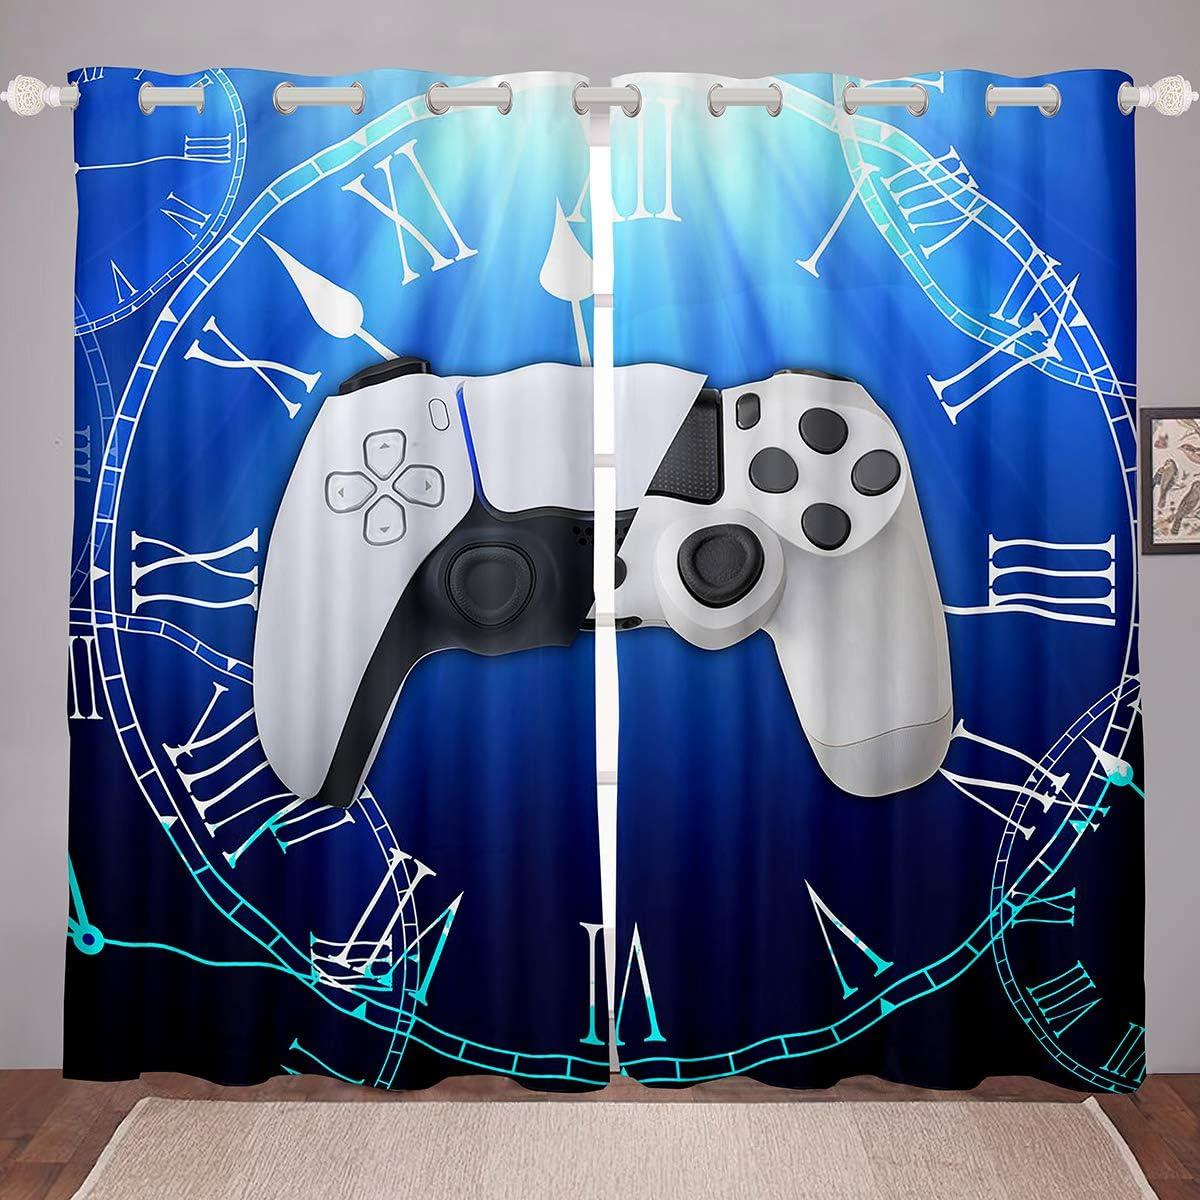 Erosebridal Kids Sale Modern Gamer Curtains for Video San Francisco Mall Bedroom Games